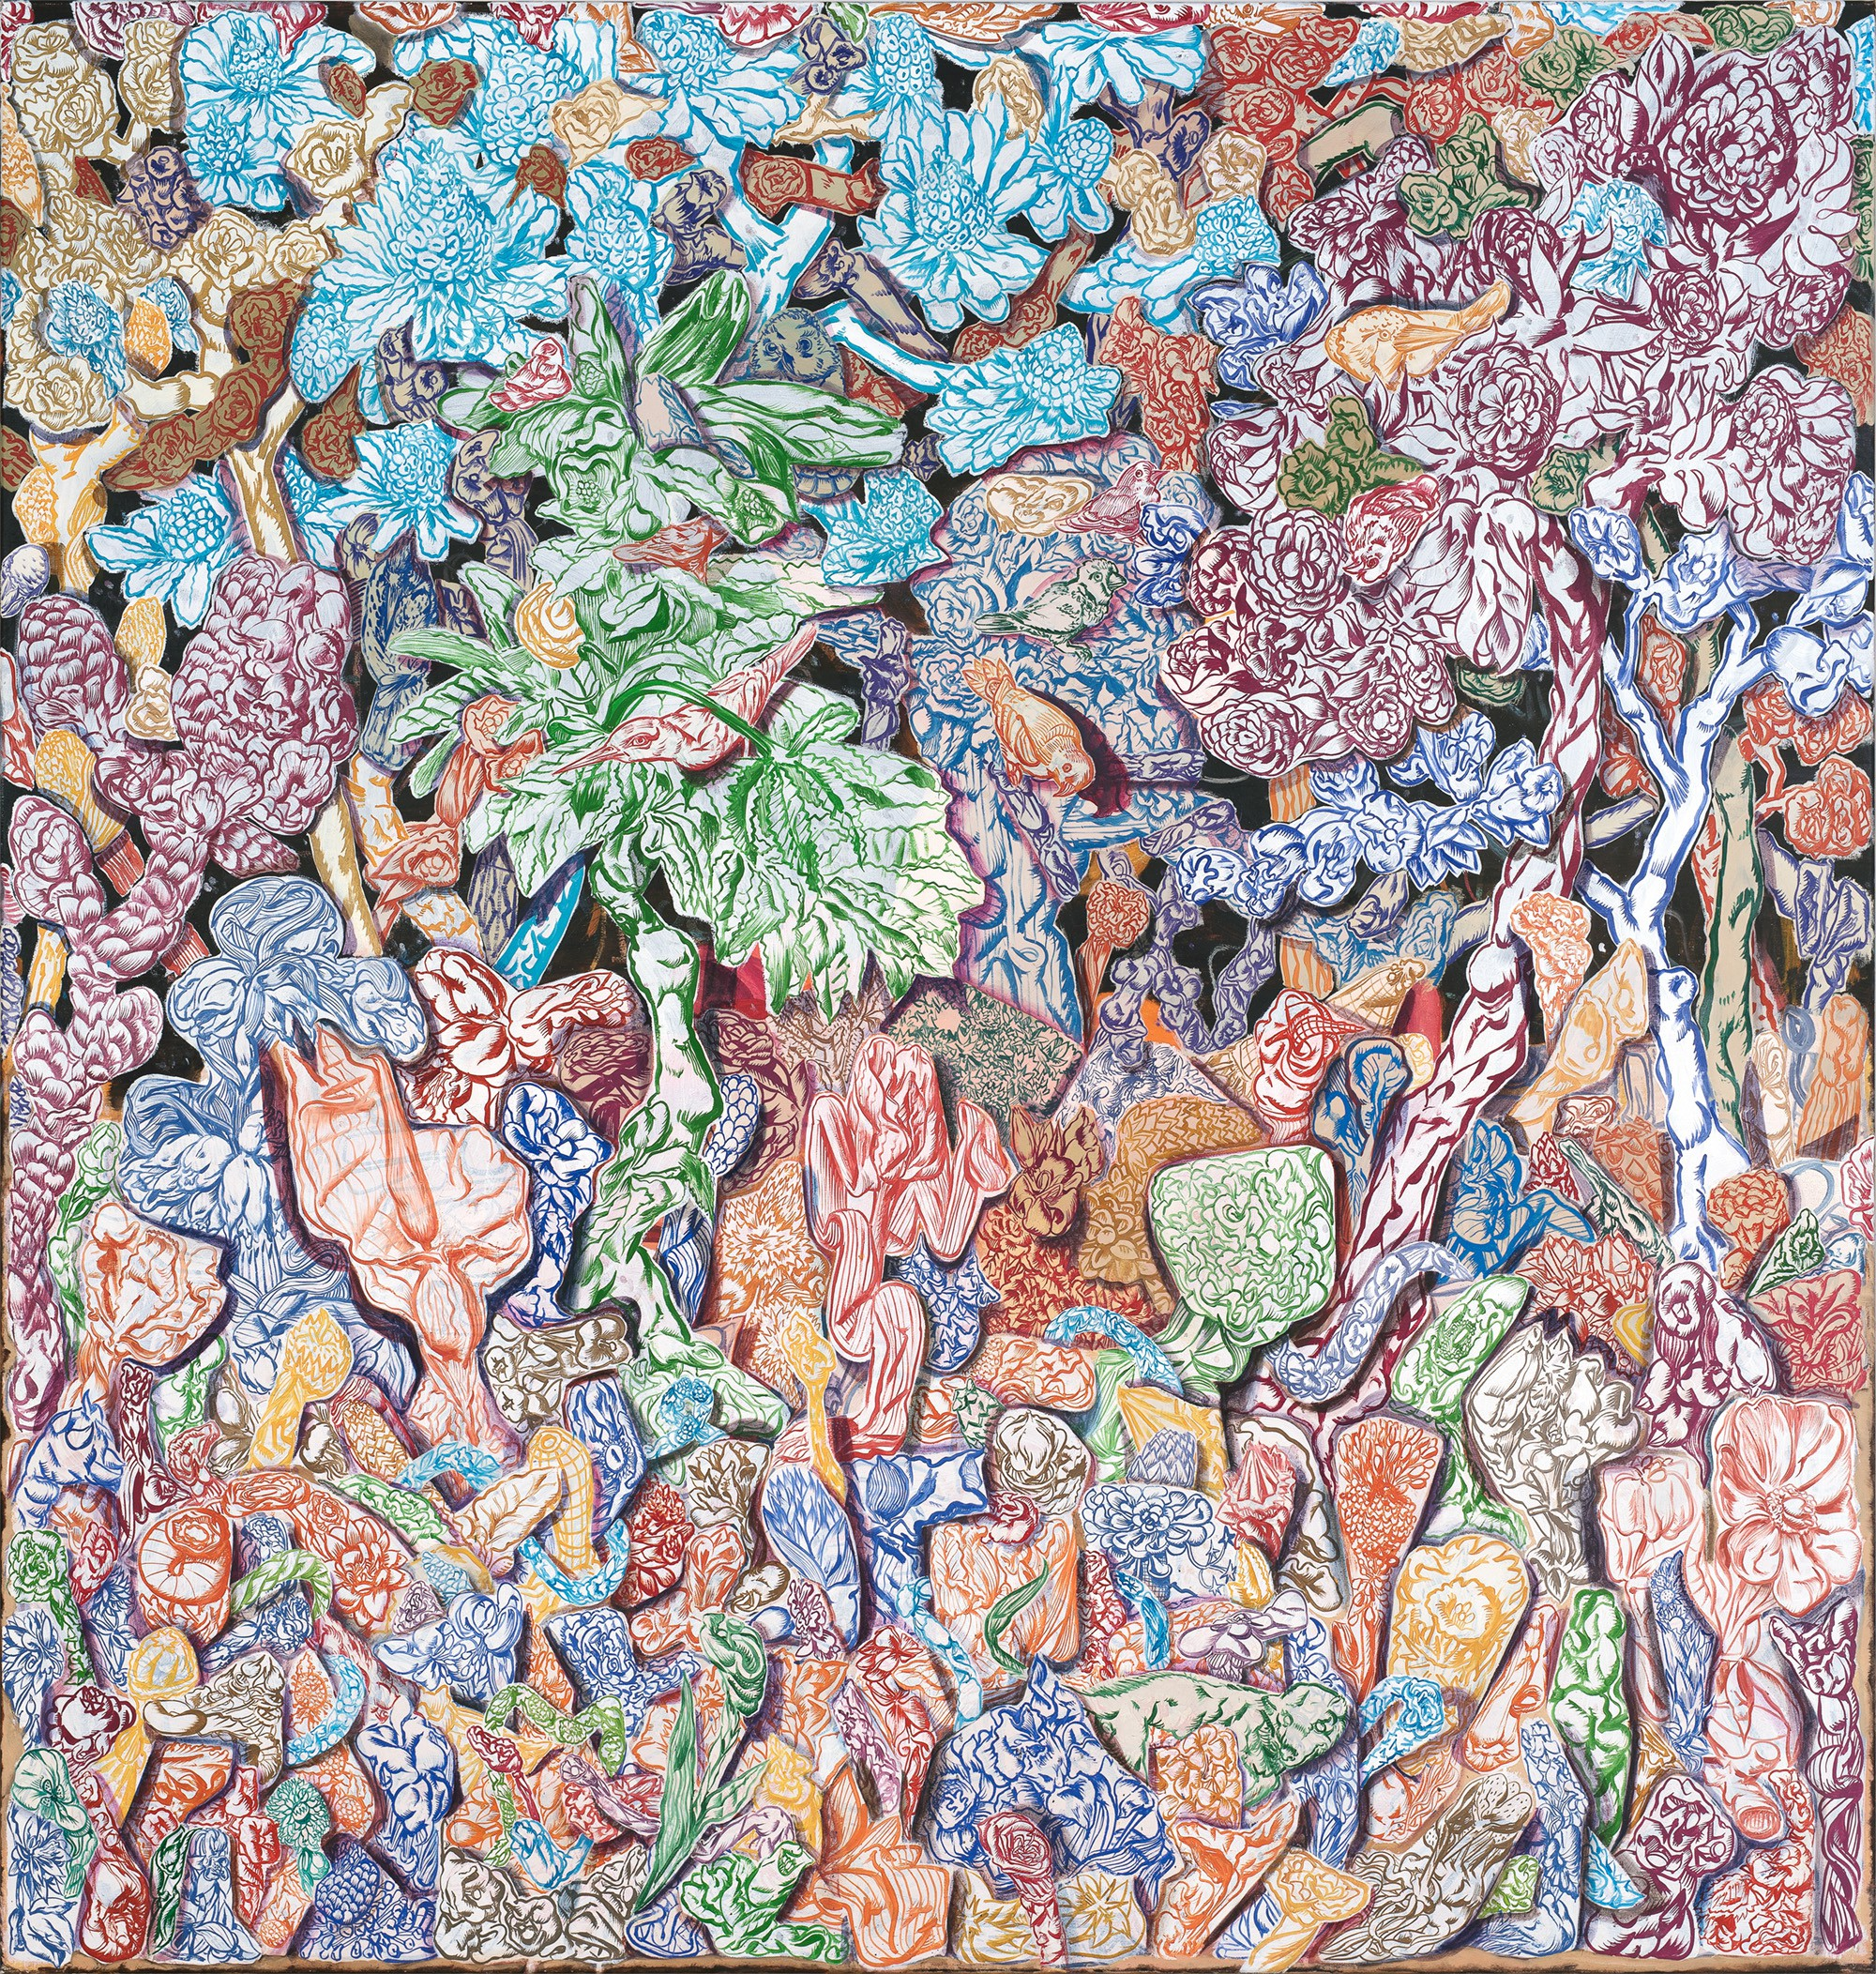 Bodo Rott | Hortus Convulsus 3, 2016, 200 x 190 cm, Öl / Lw